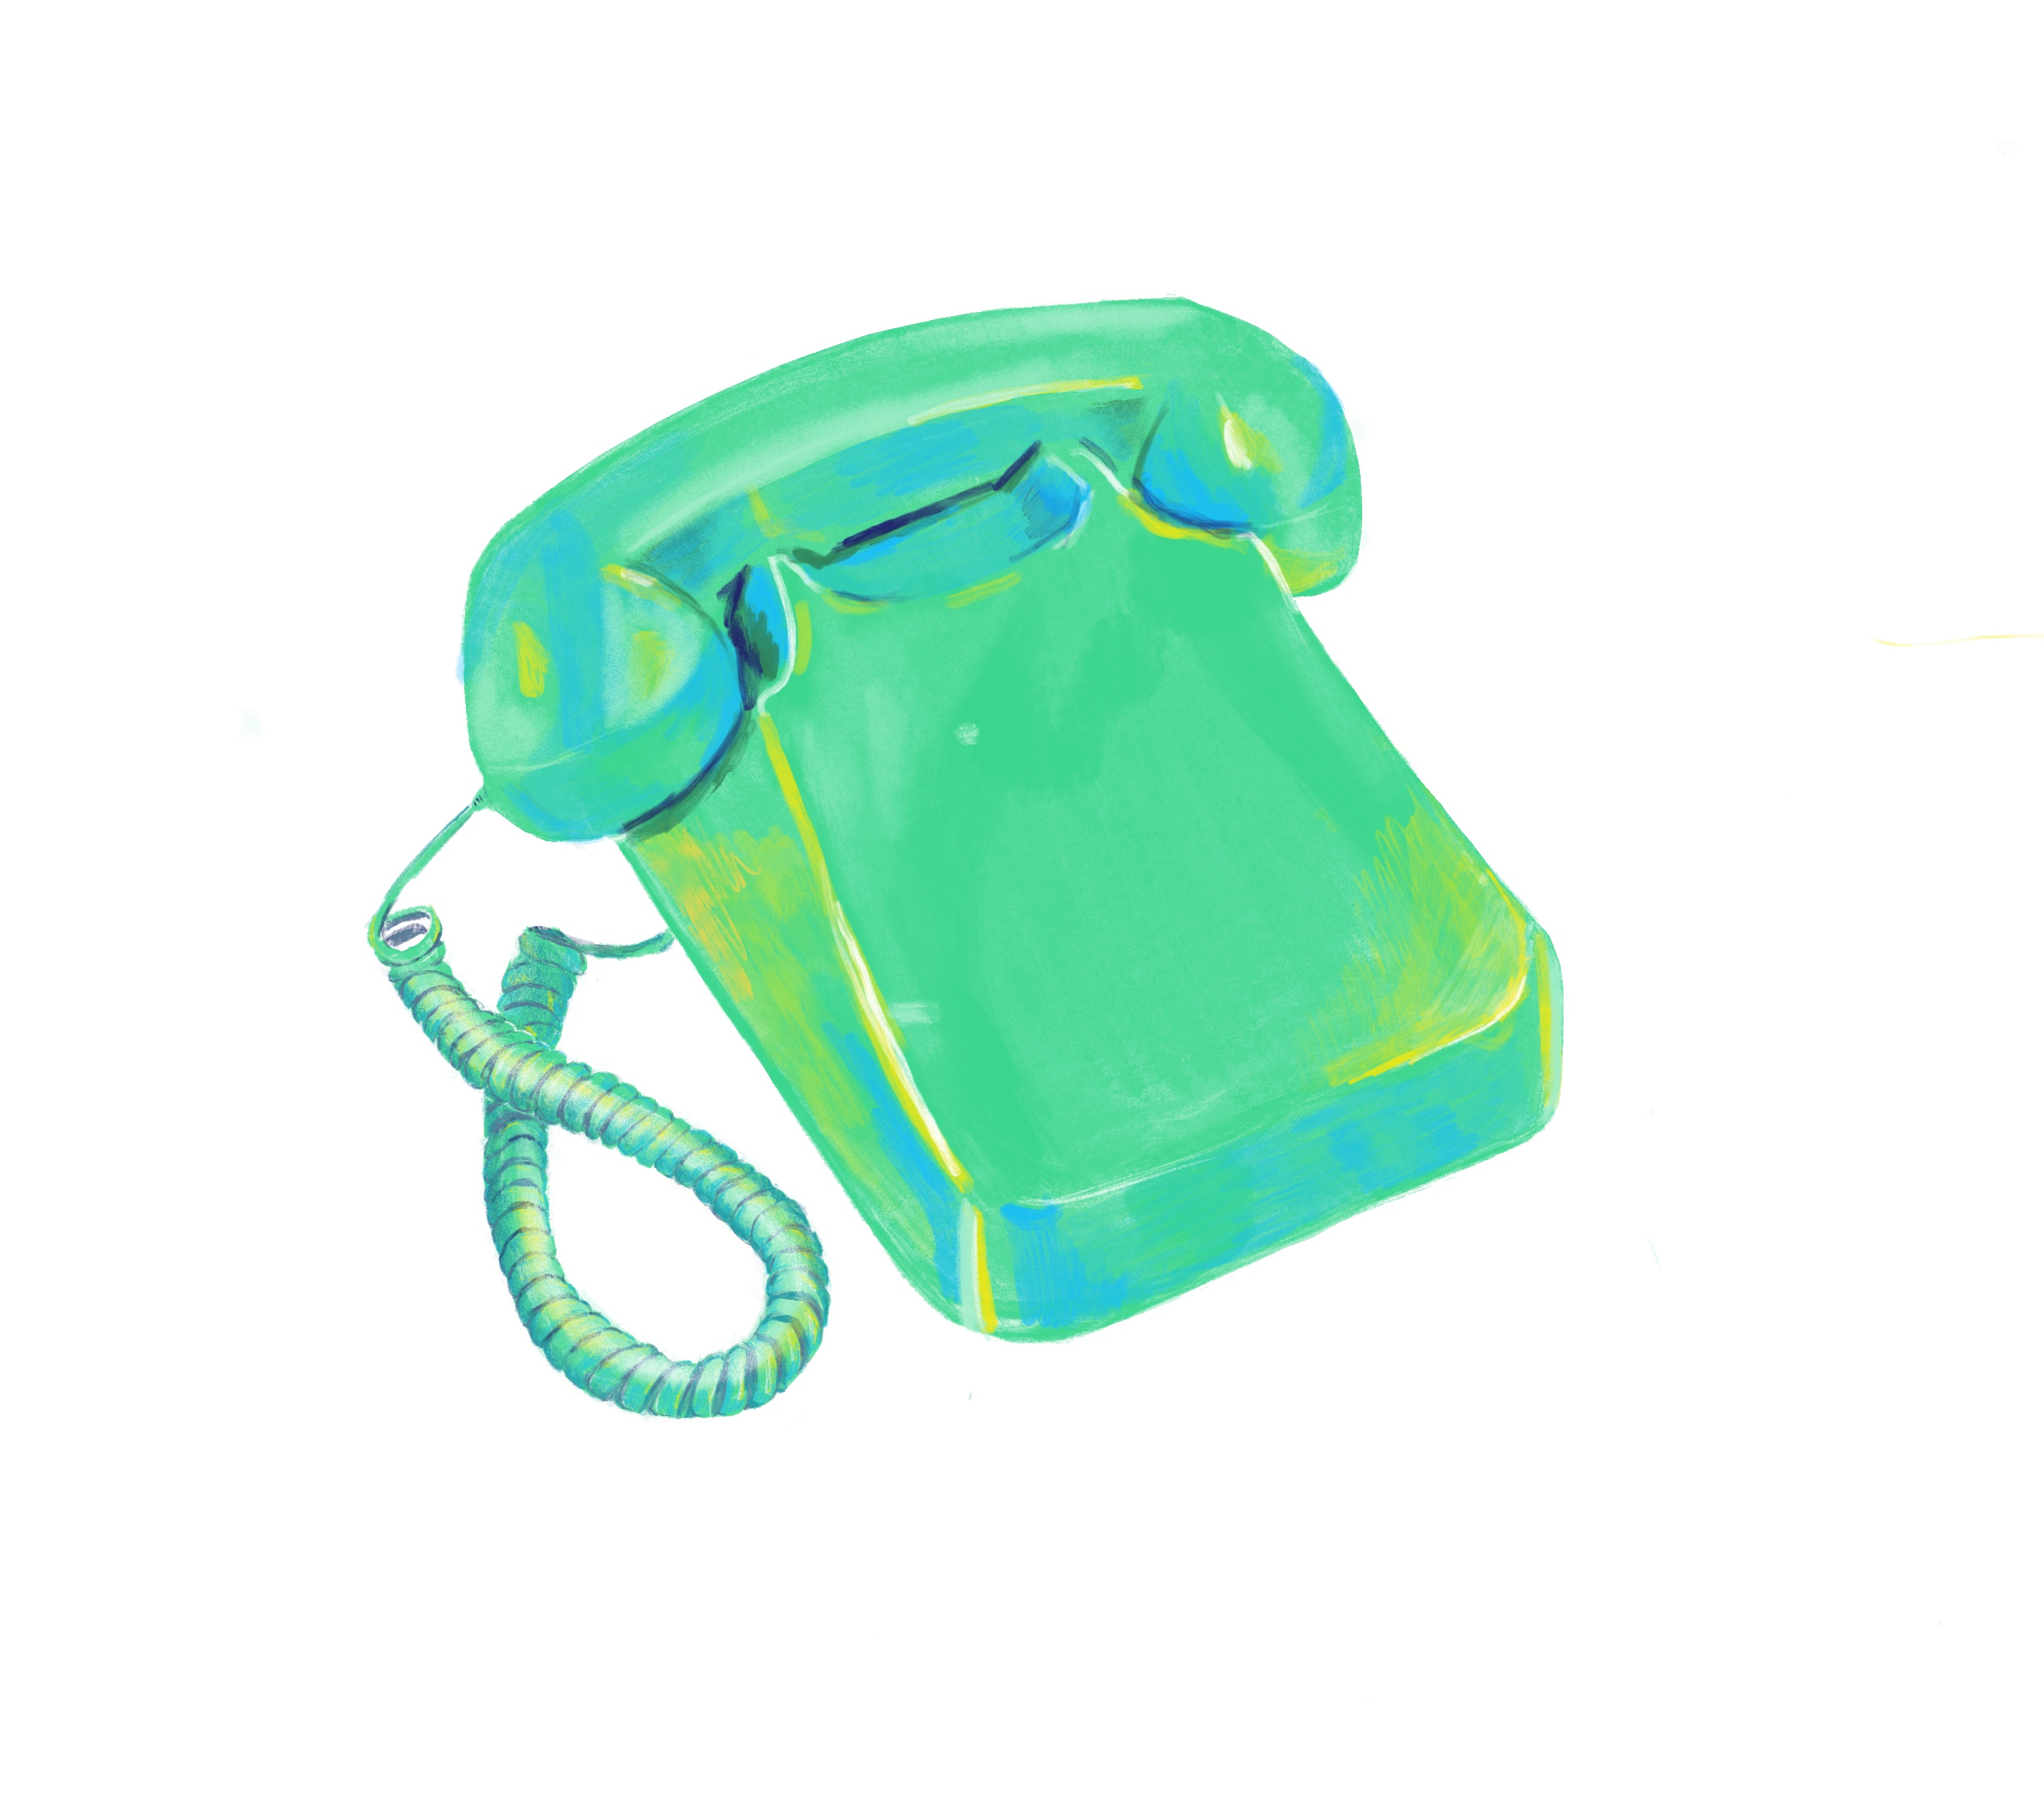 Useless phone